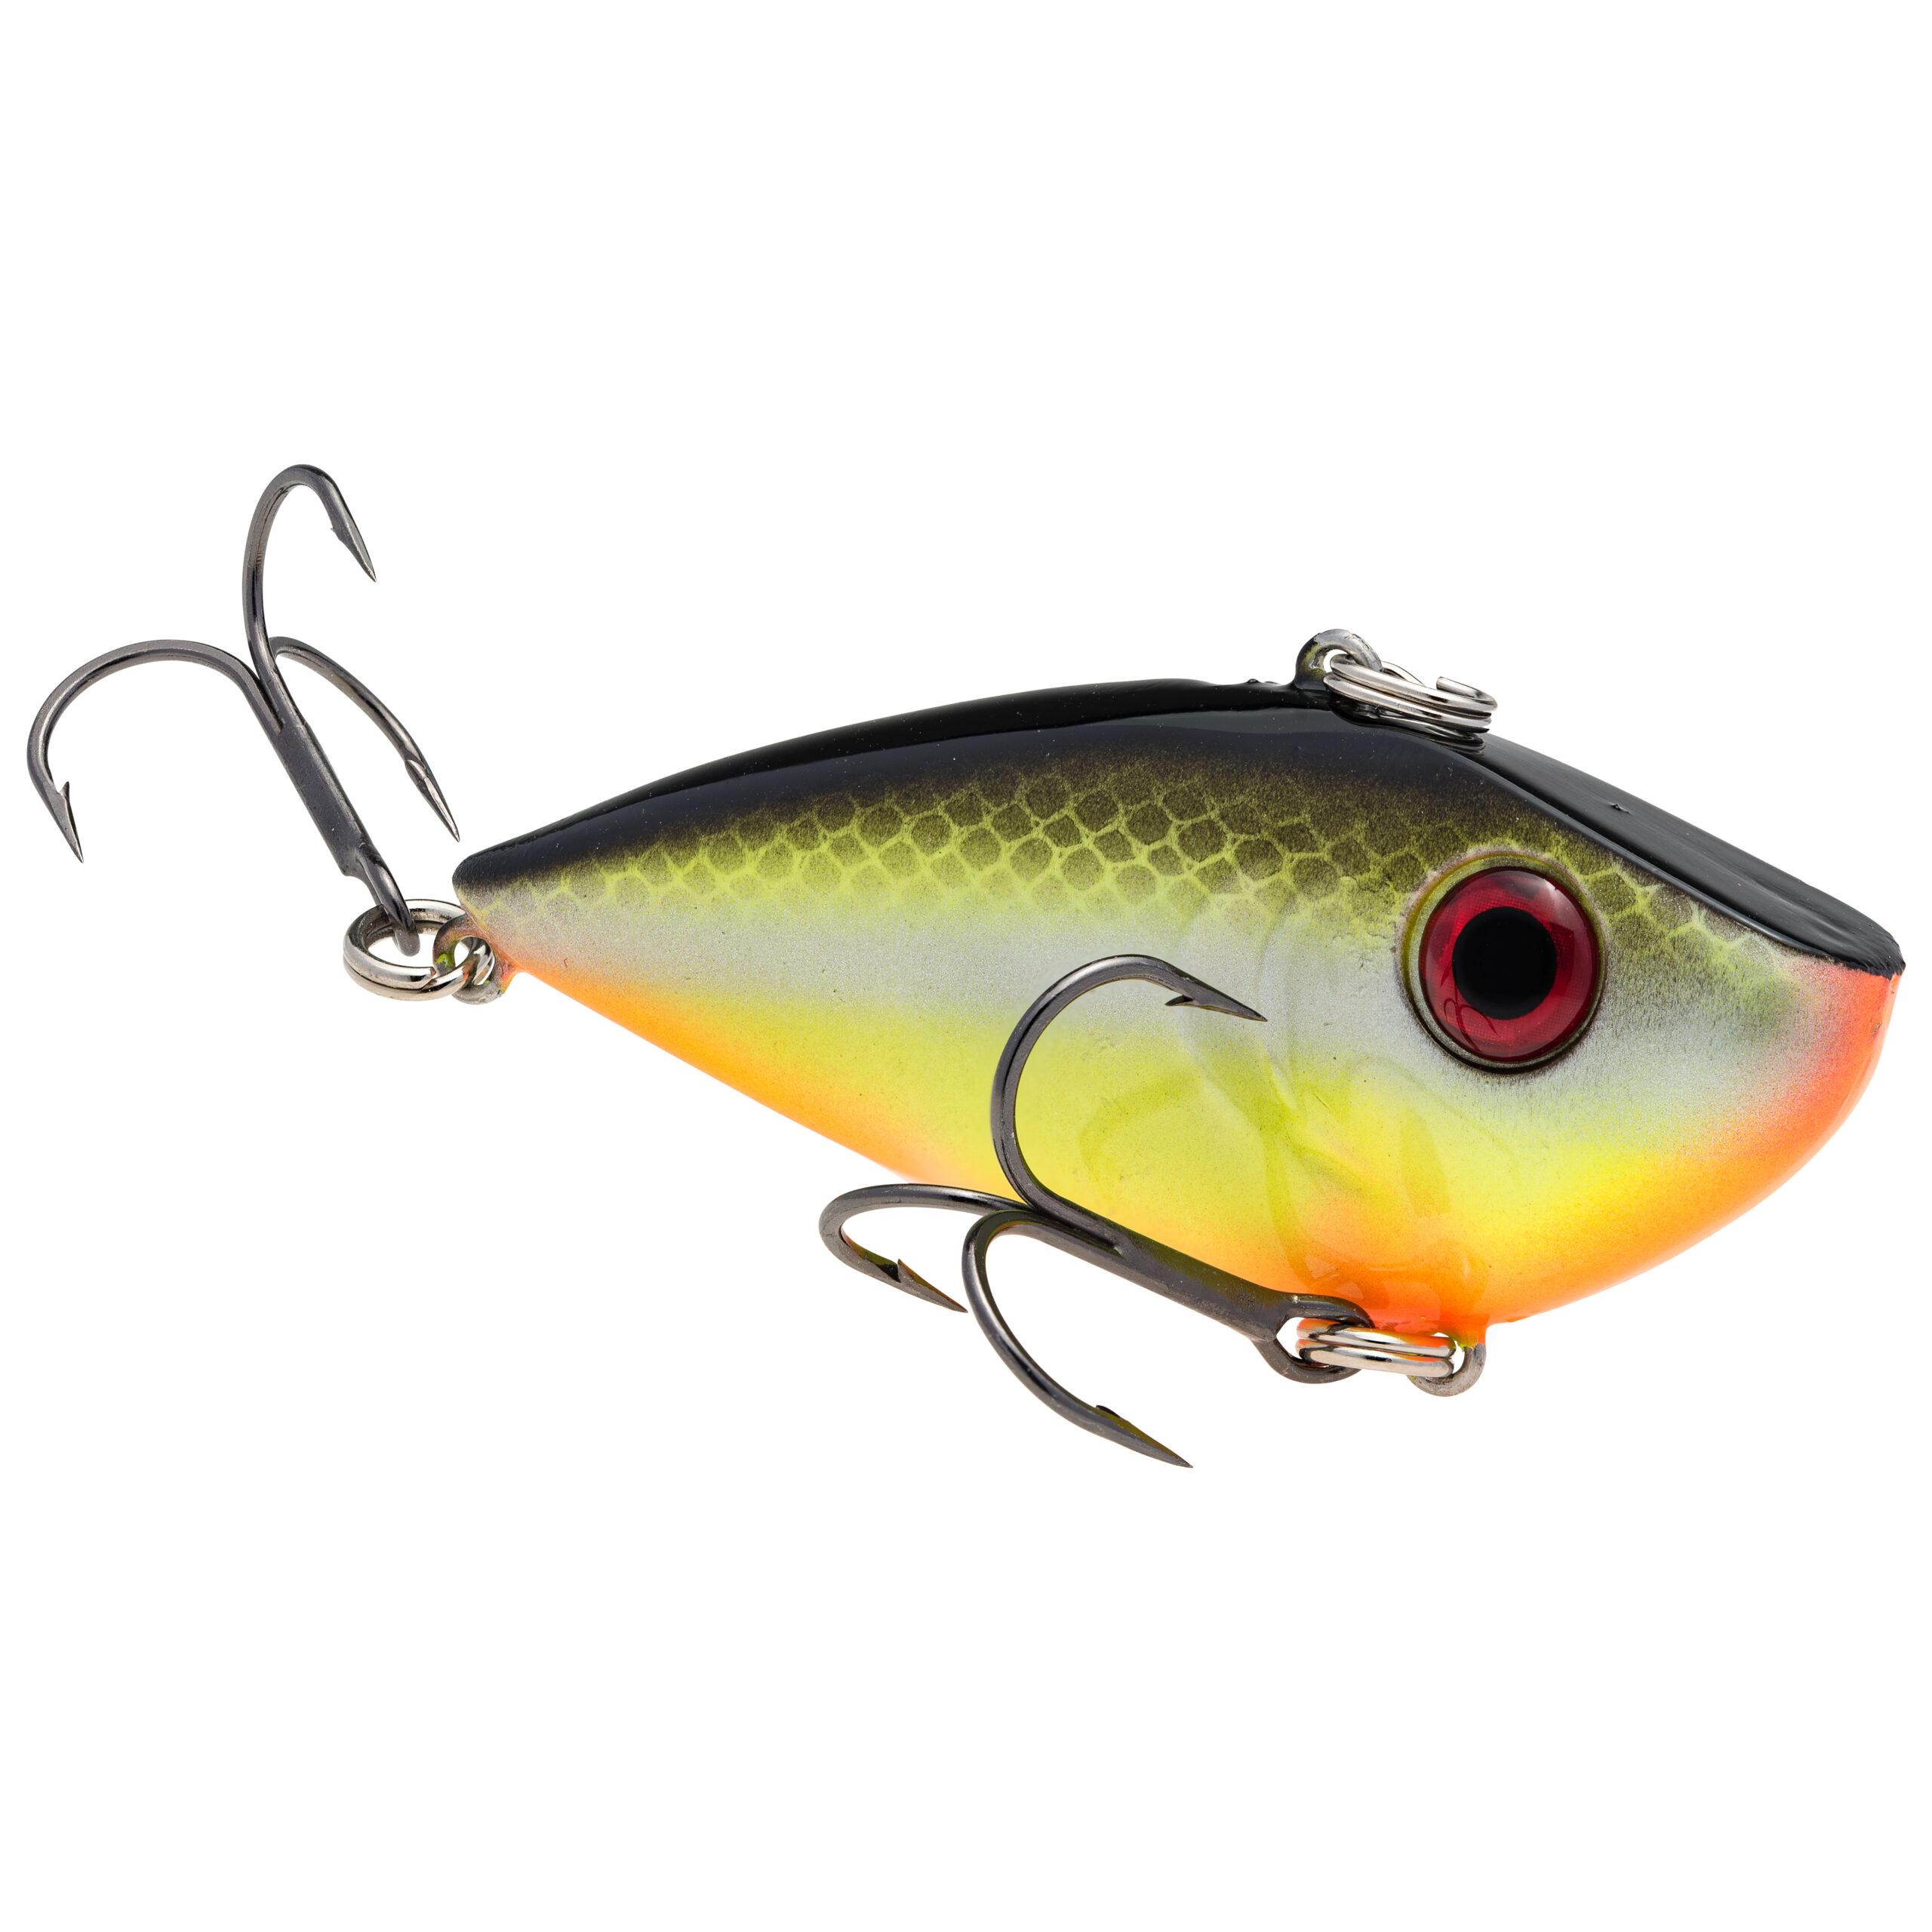 Strike King Lures – Crankbaits – Lipless Rattle Trap – Red Eyed Shad - 1/4oz - REYESD14-432 - Chartreuse Baitfish